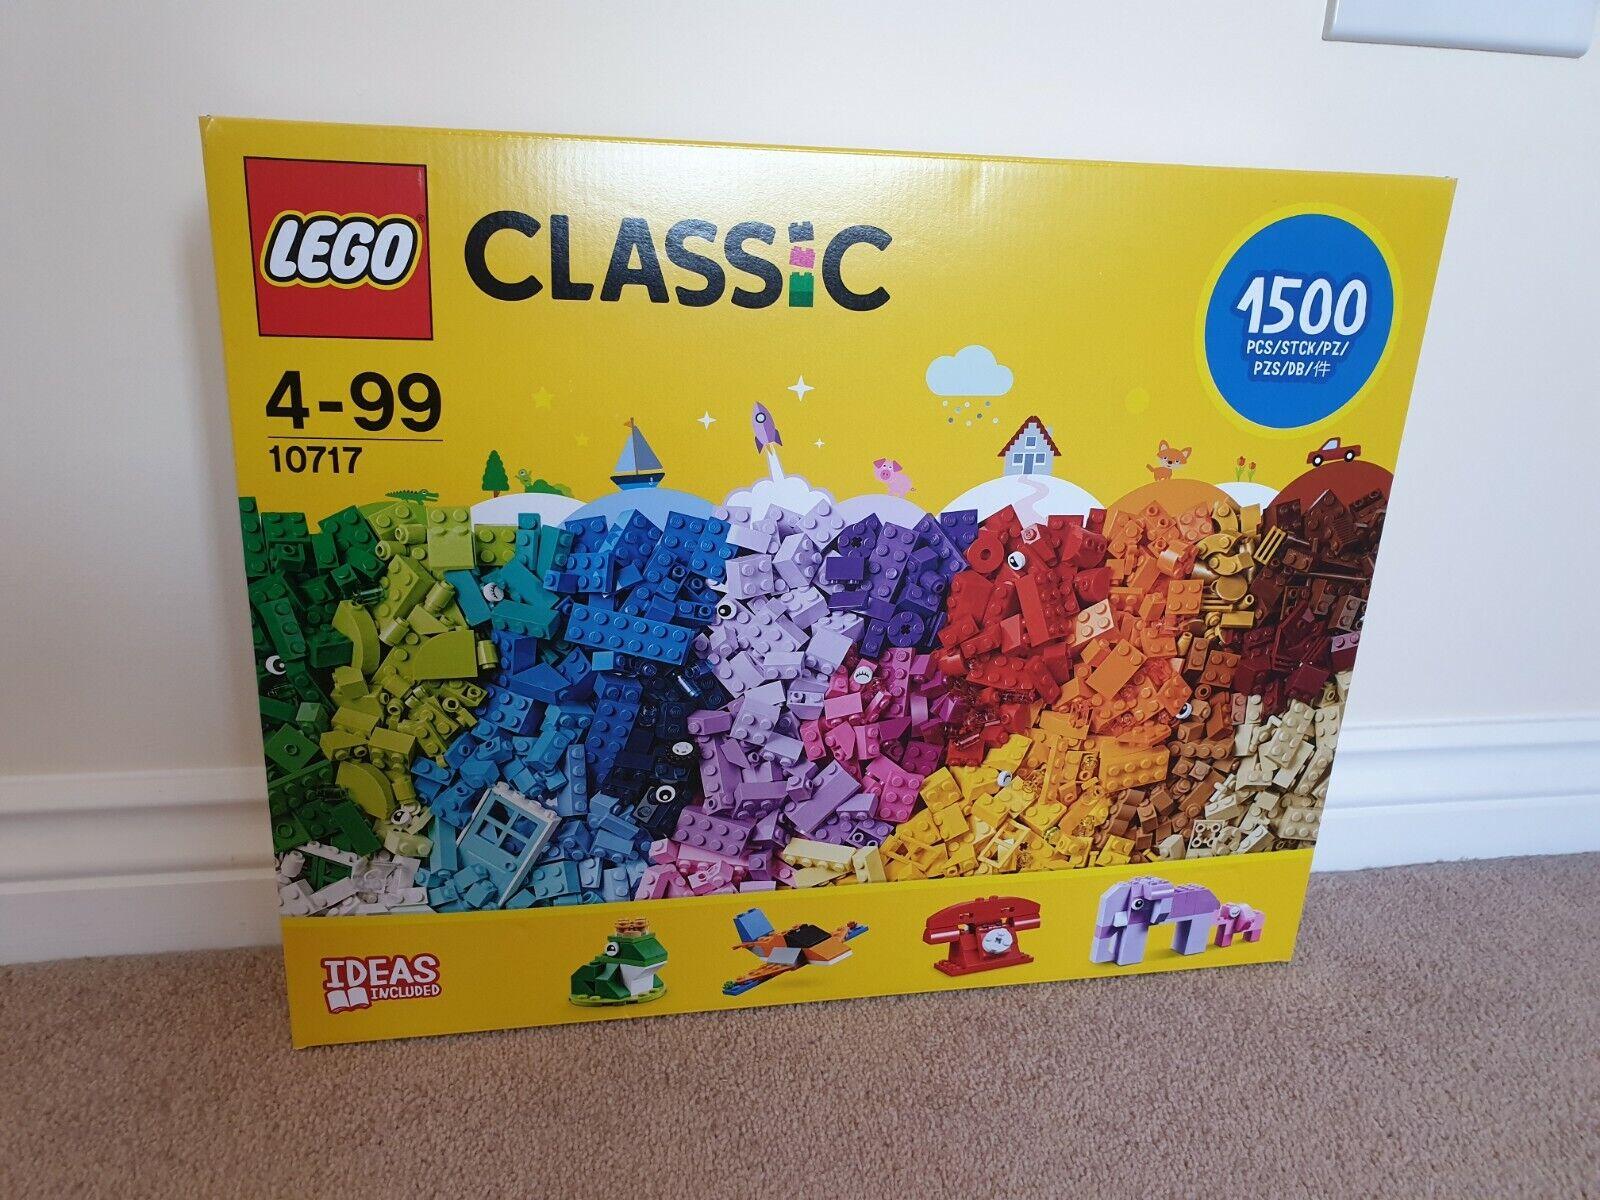 Lego 10717 Classic Bricks Starter Set with Ideas - New & Sealed with Damaged Box